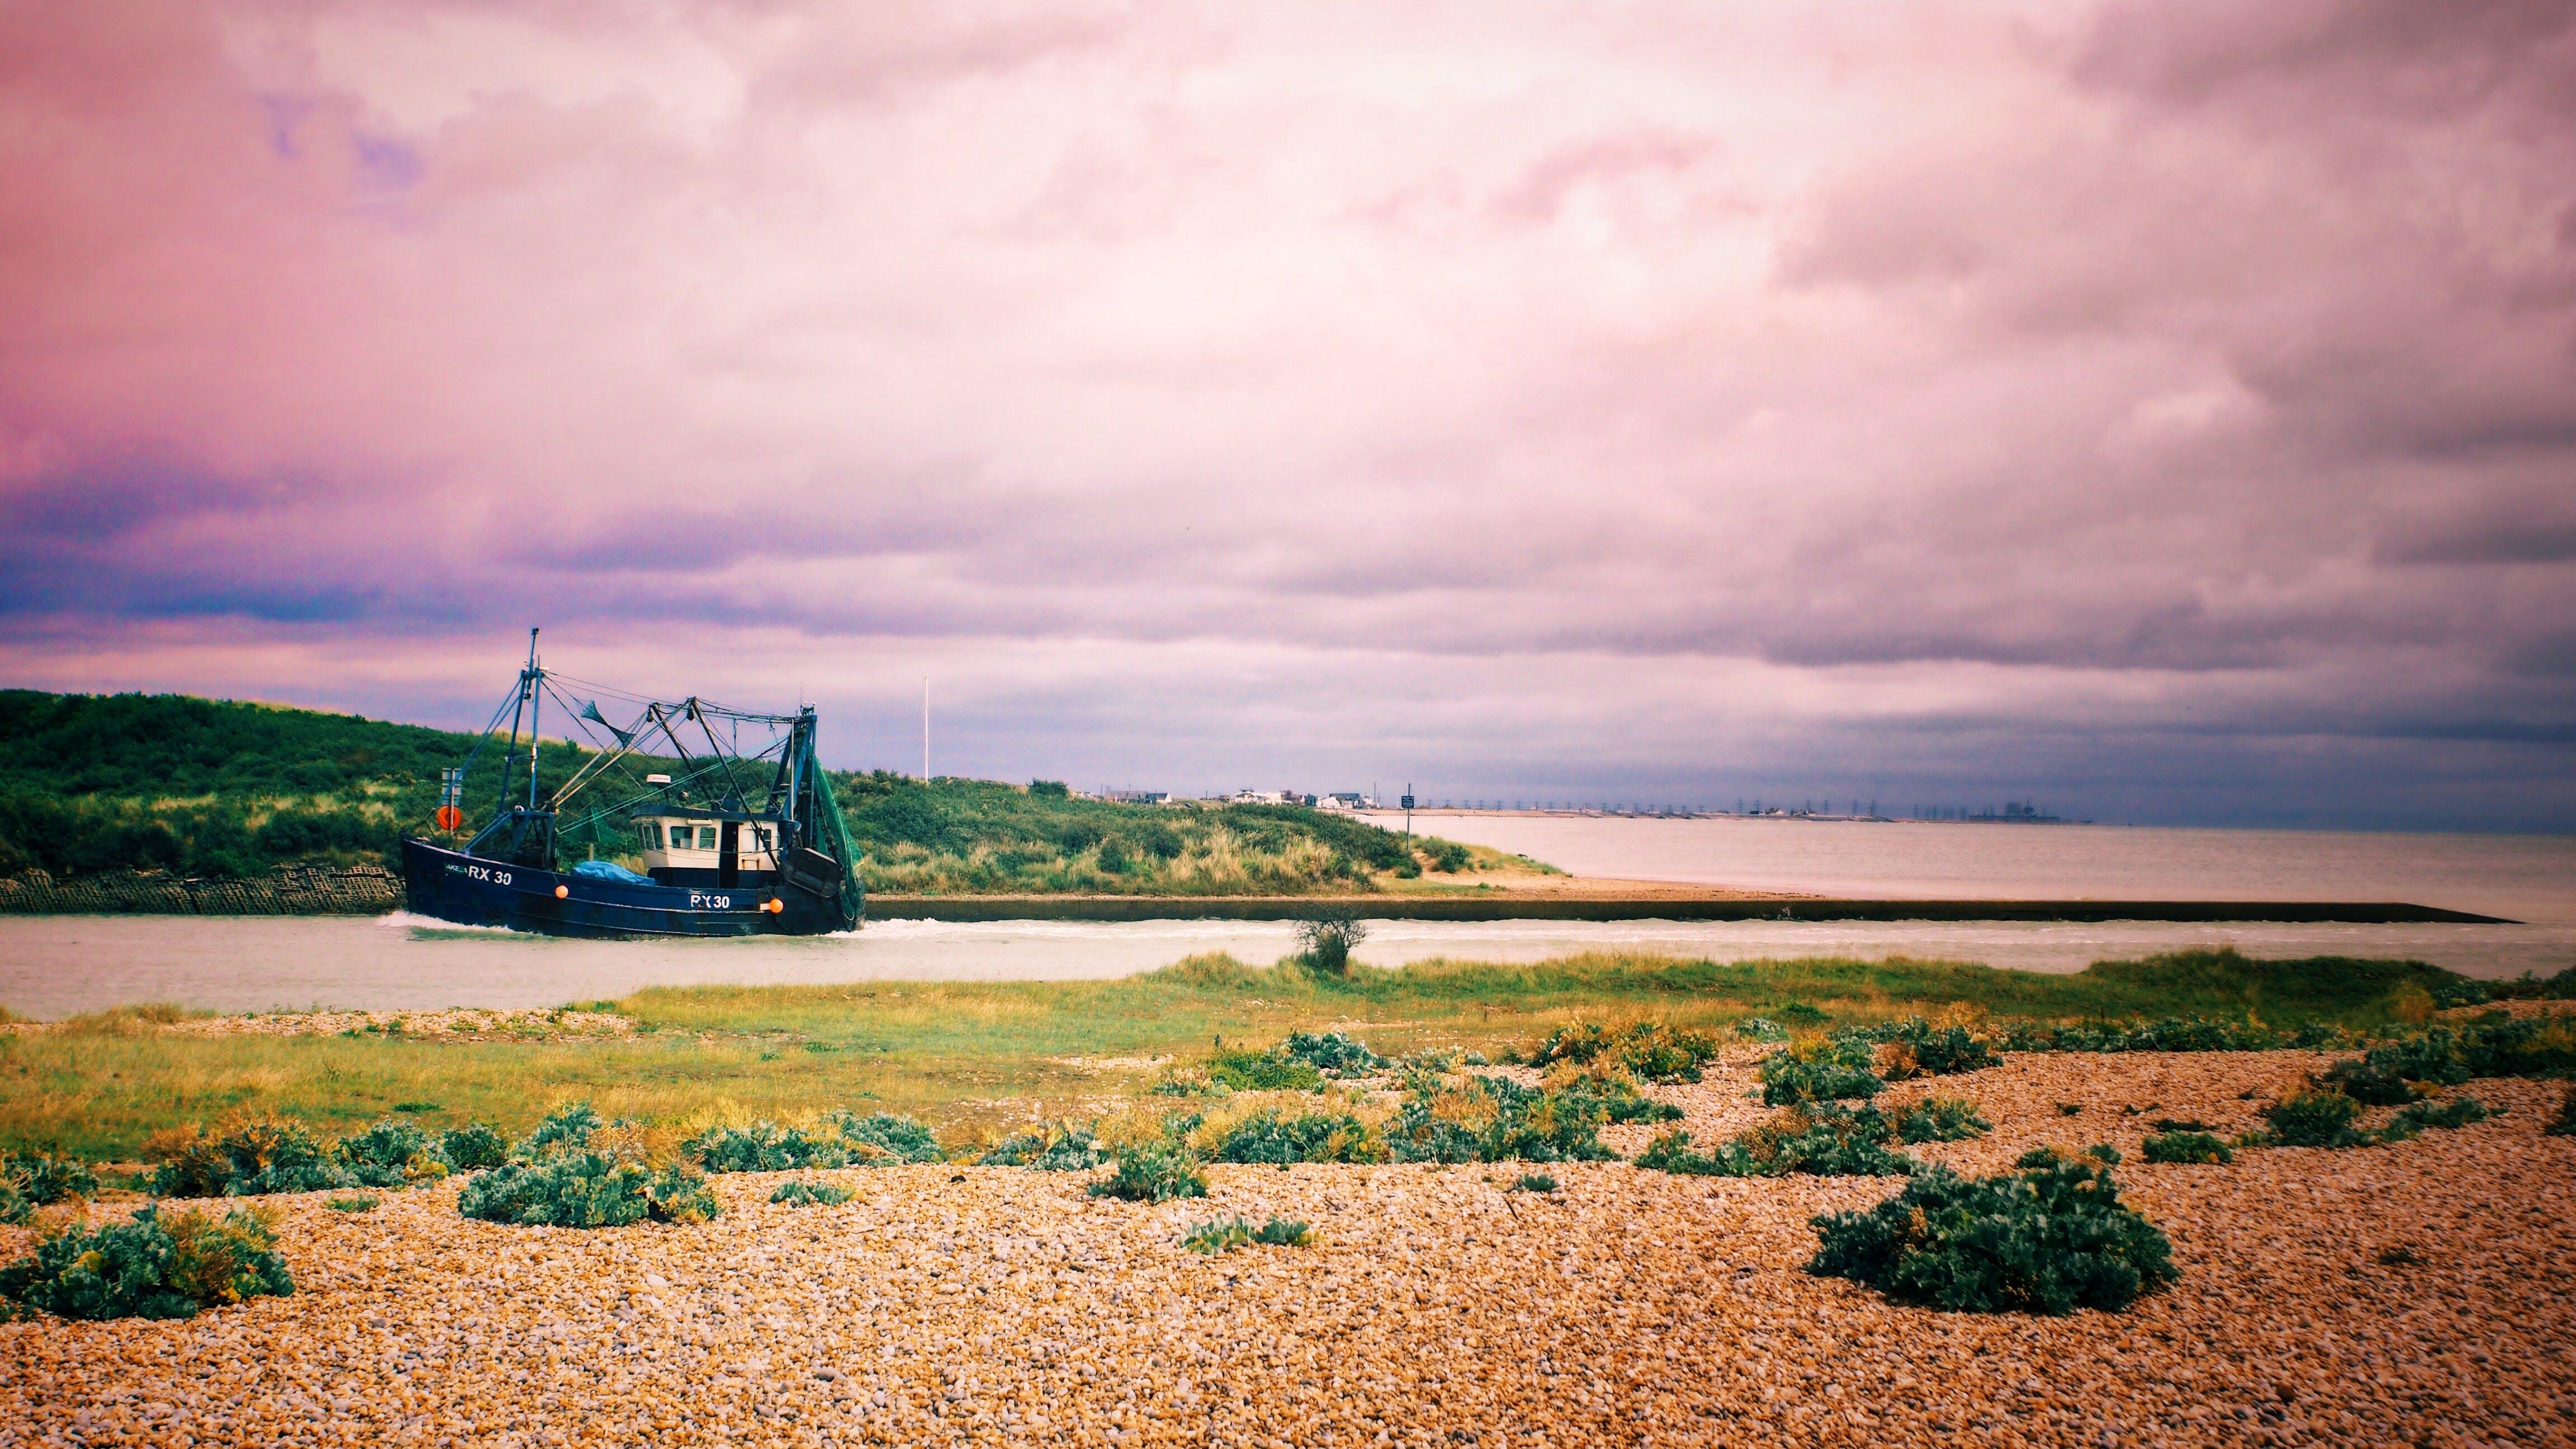 Black Galleon Ship on River Photo